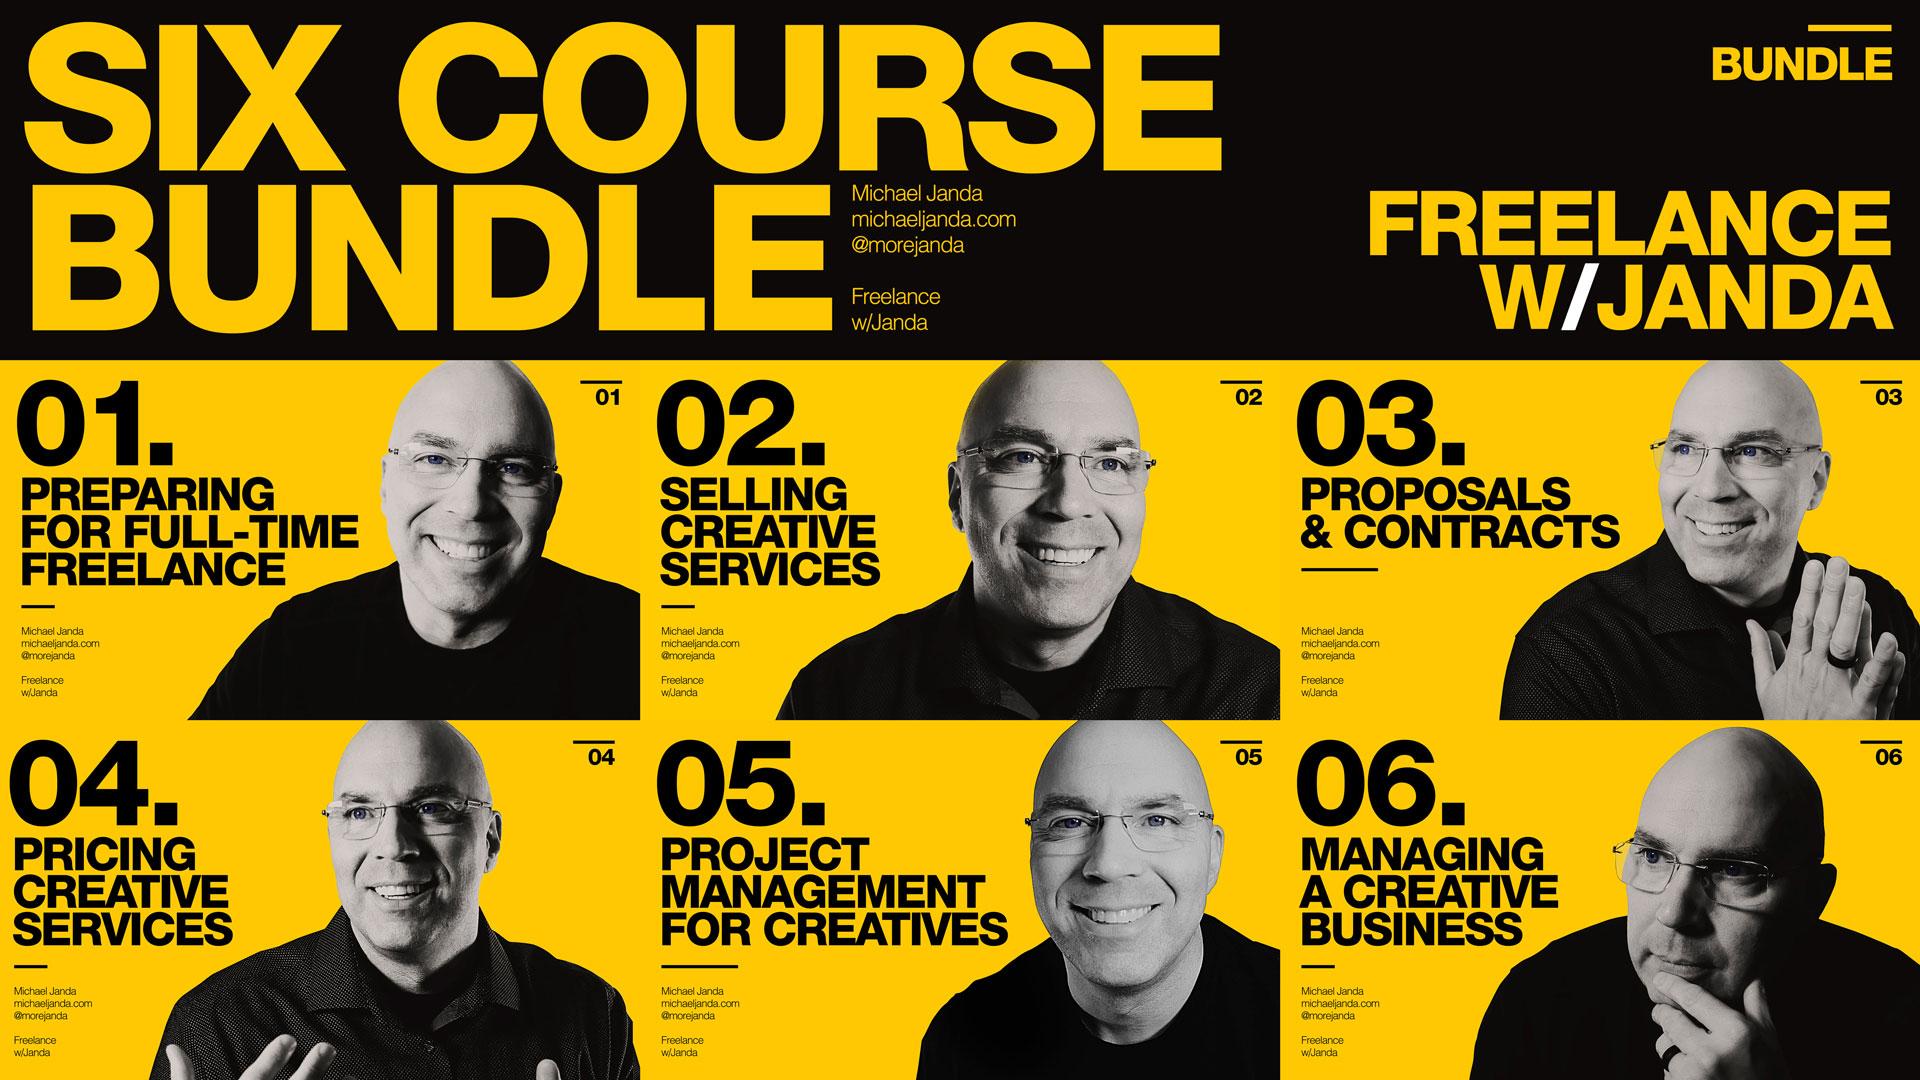 Freelance with Janda Six Course Bundle